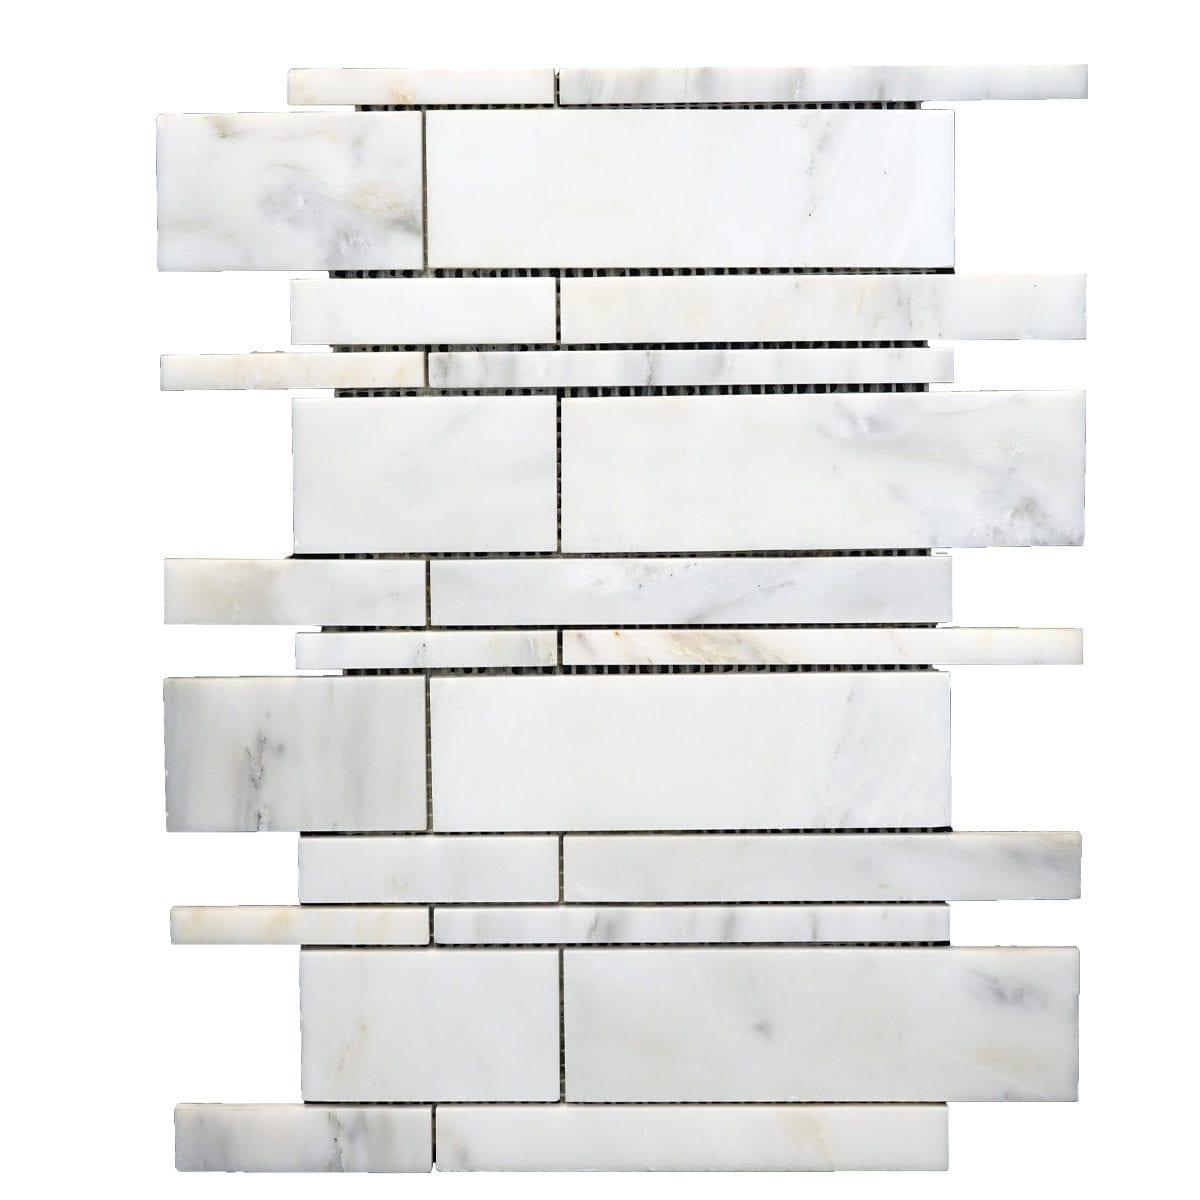 M50335—MSTARI—WHITE CARRARA MARBLE